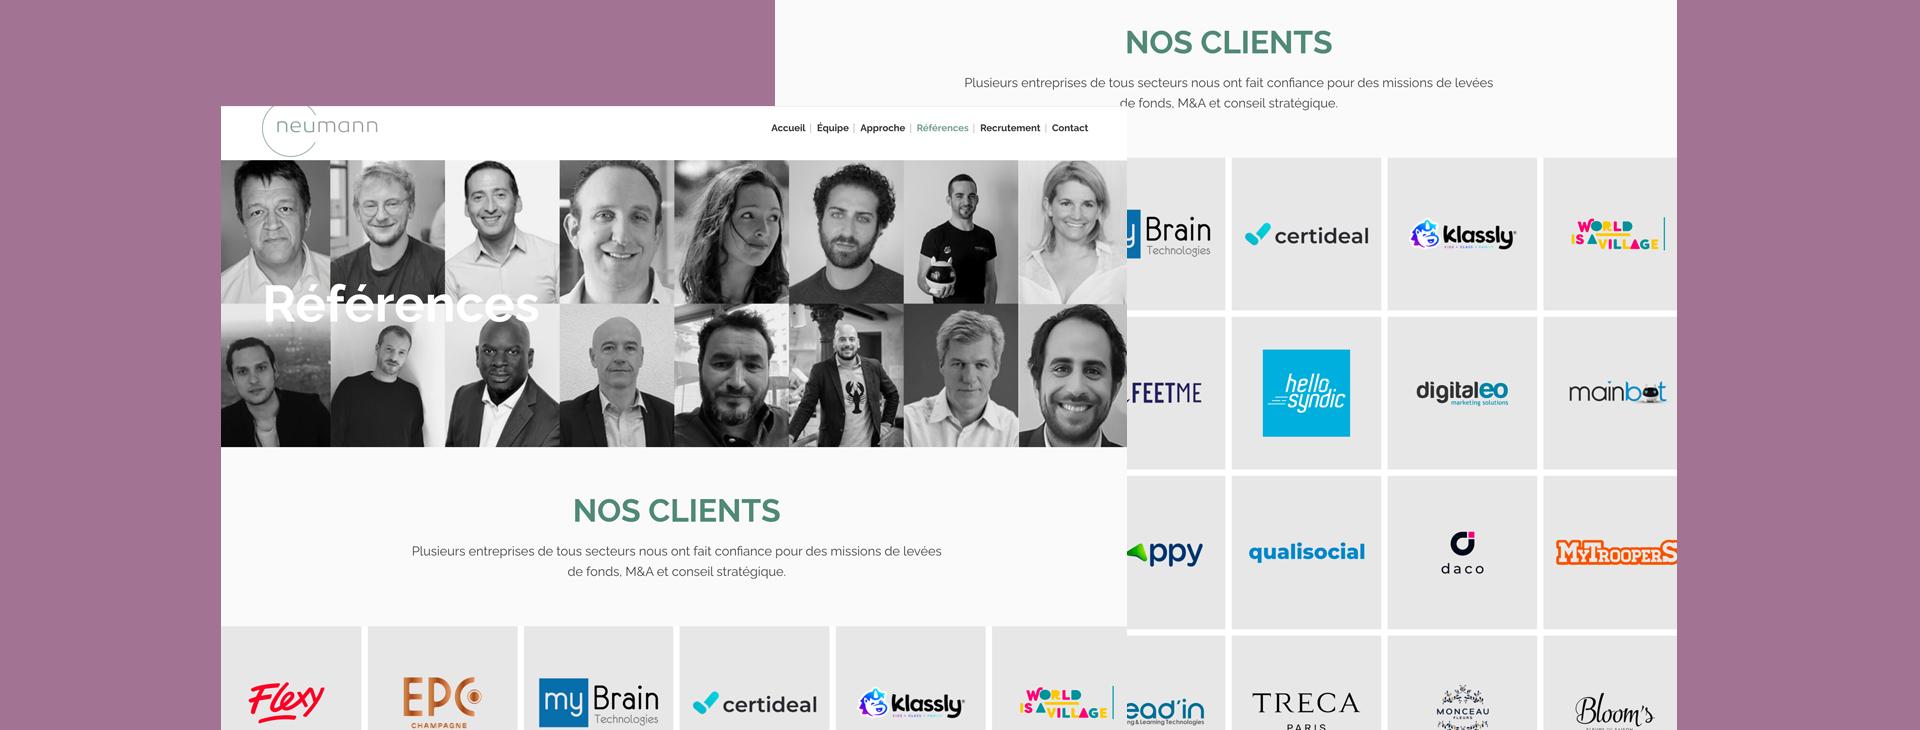 neumann_clients